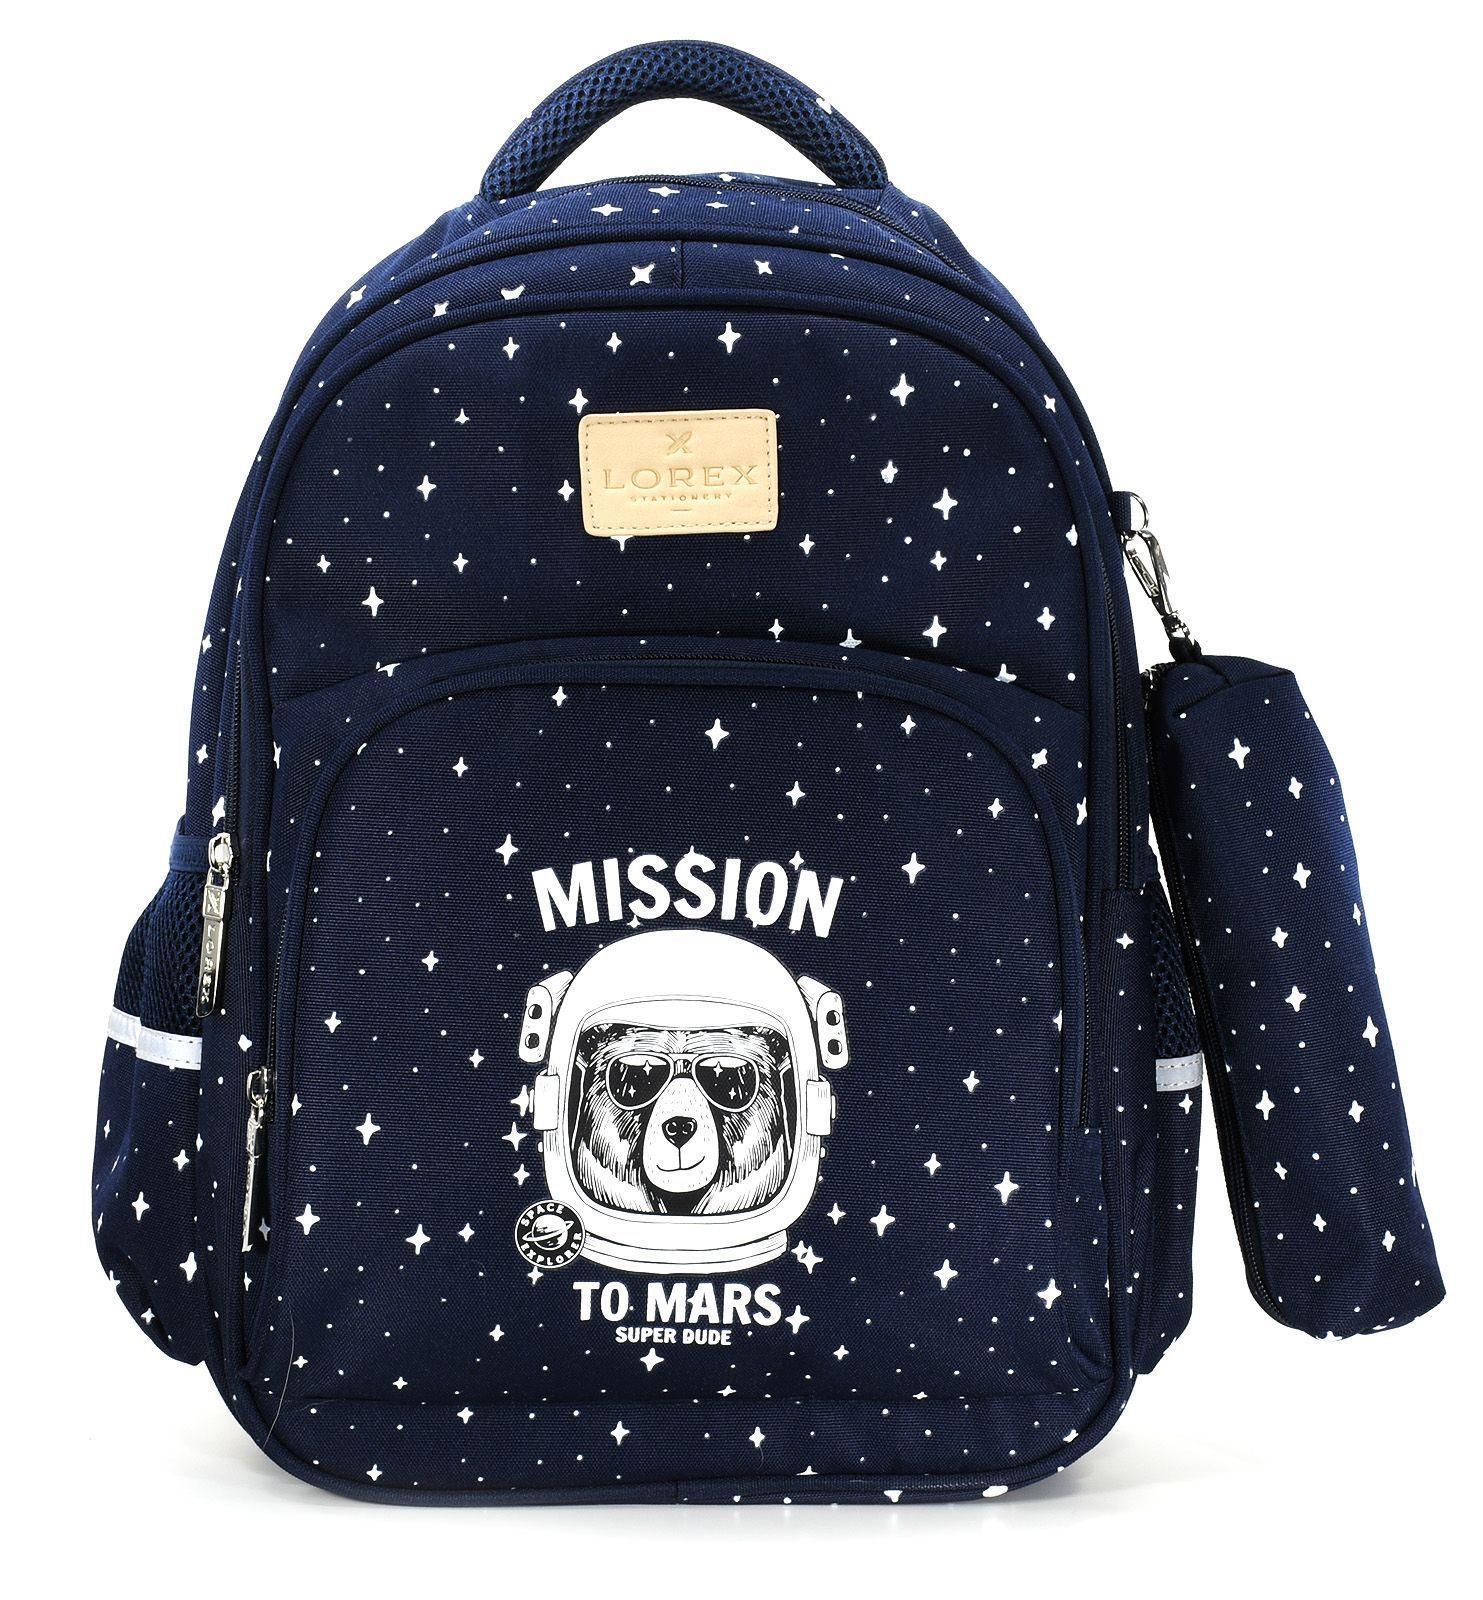 Рюкзак LOREX MARS MISSION, модель ERGONOMIC M10, мягкий каркас, односекционный, 40,5х29х14 см, 17 л, для мальчиков